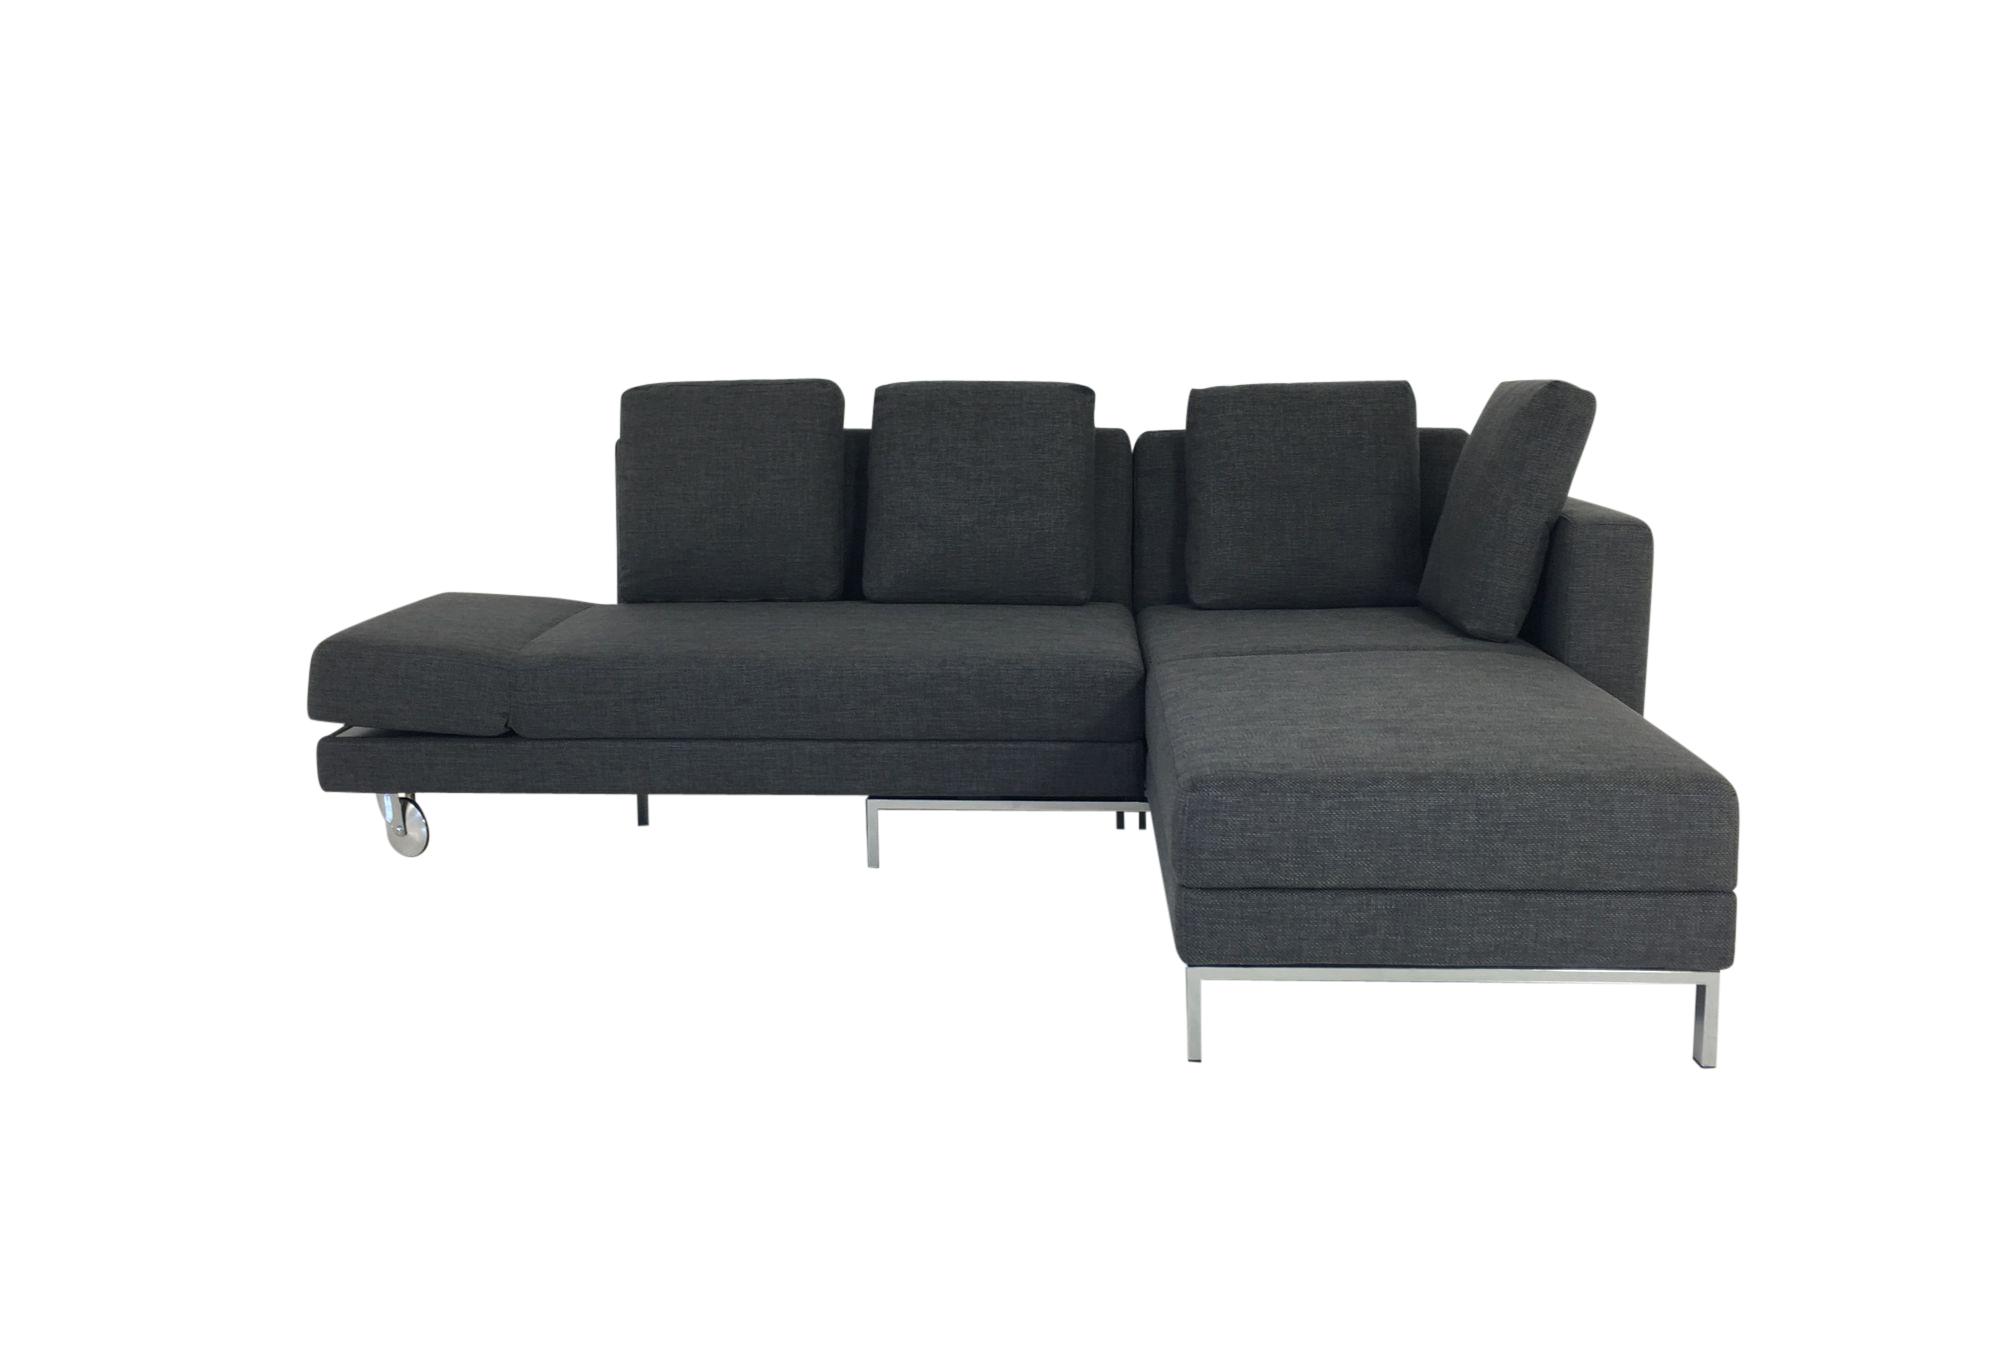 br hl four two sofa mit recamiere und bettfunktion in. Black Bedroom Furniture Sets. Home Design Ideas